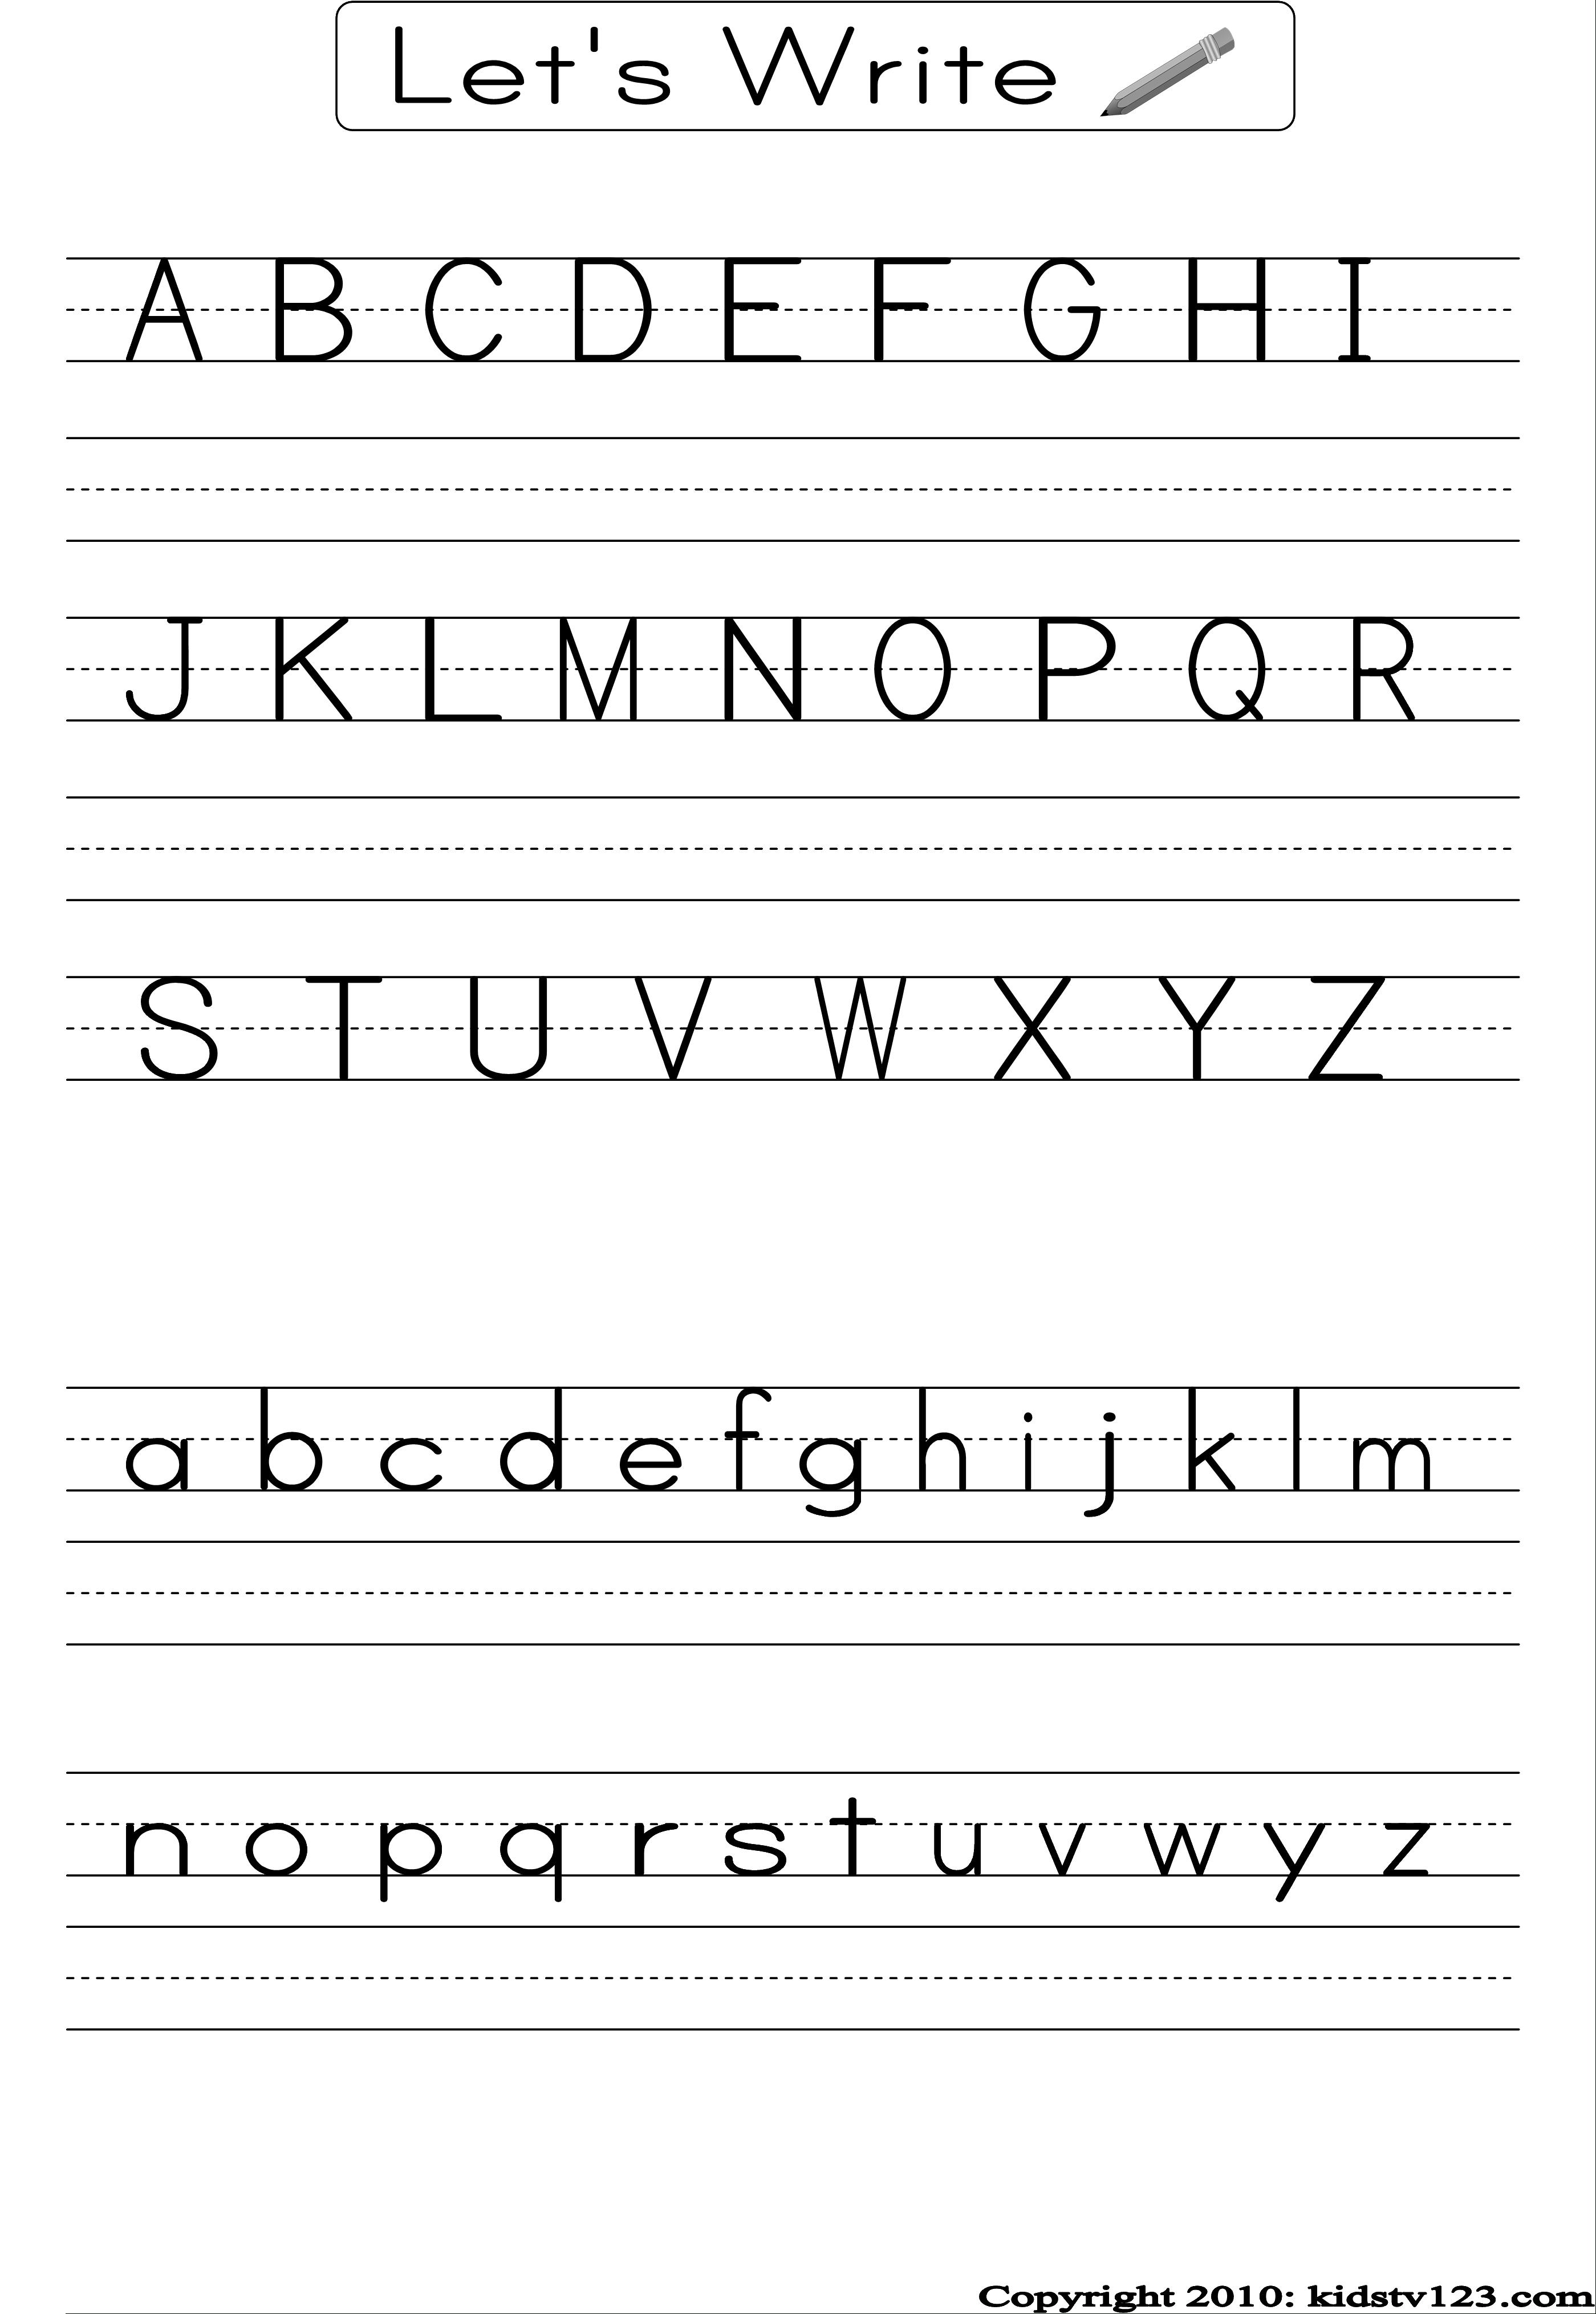 Alphabet Writing Practice Sheet | Edu-Fun | Alphabet Worksheets | Free Printable Letter Worksheets